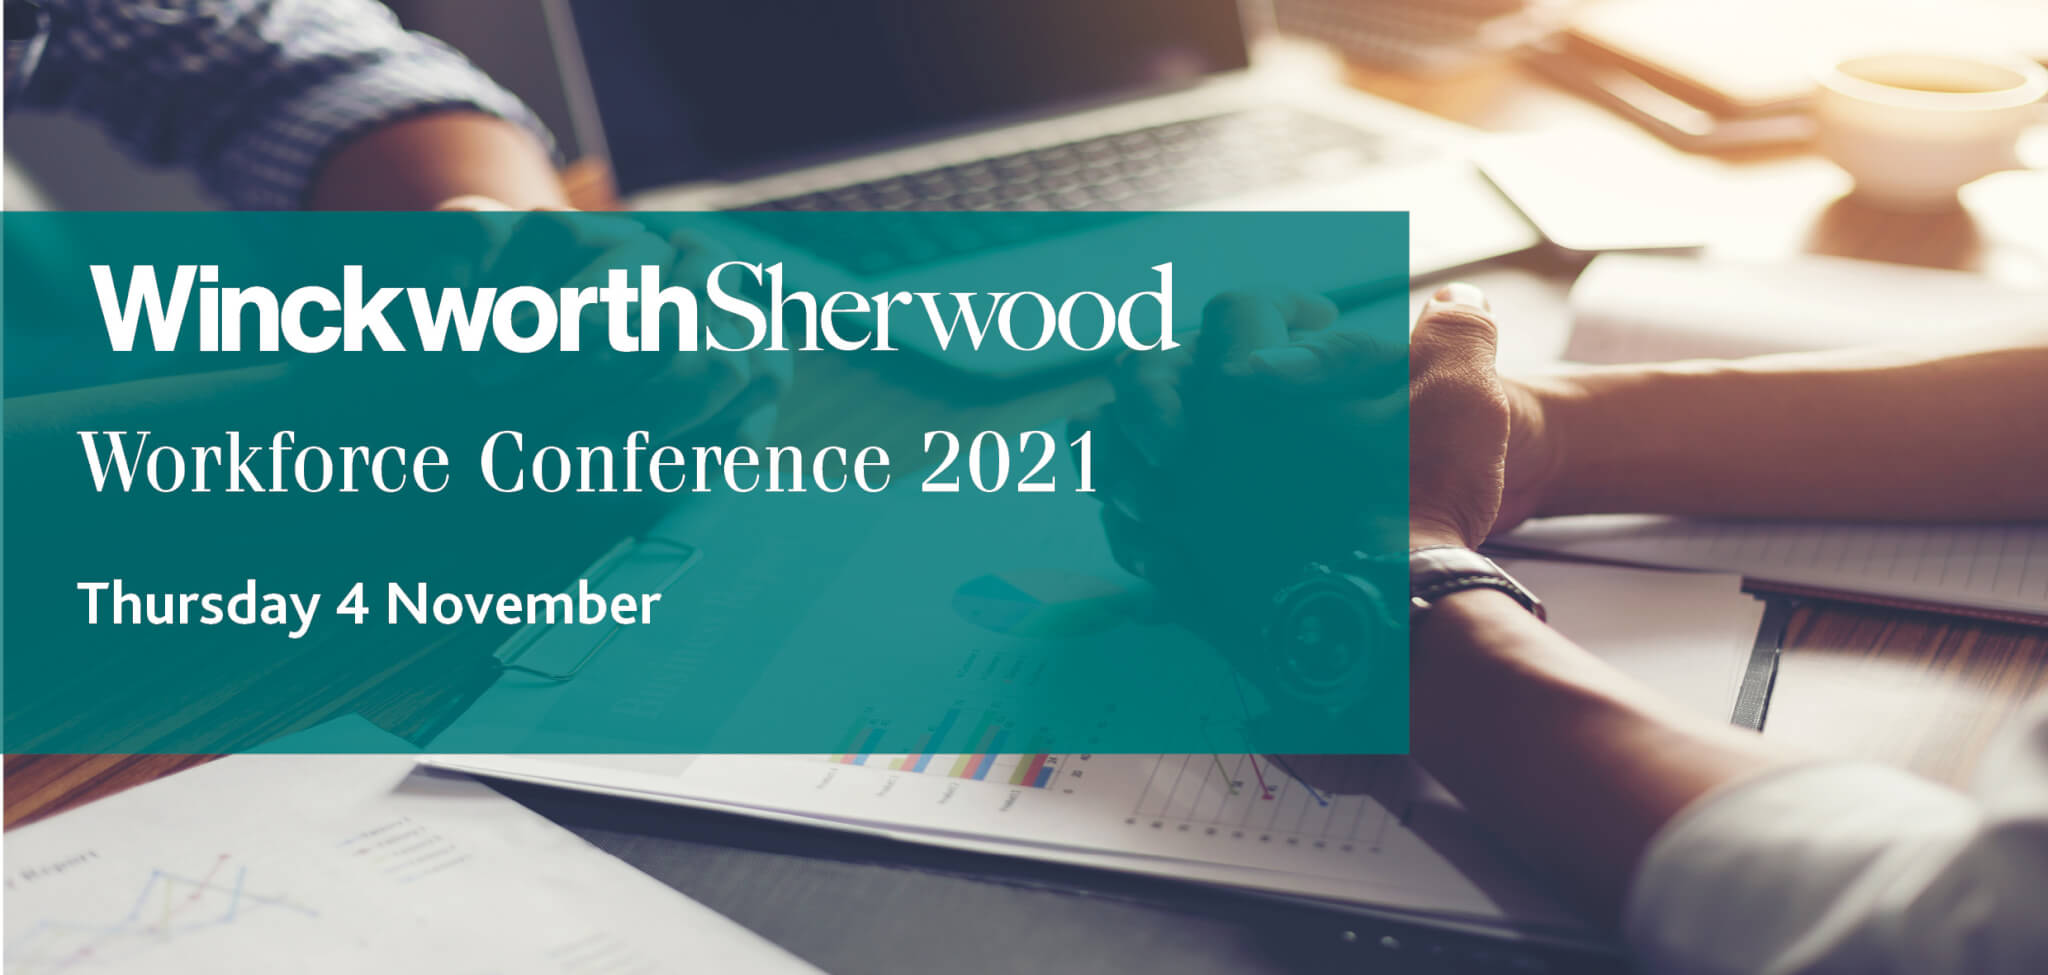 Workforce Conference 2021